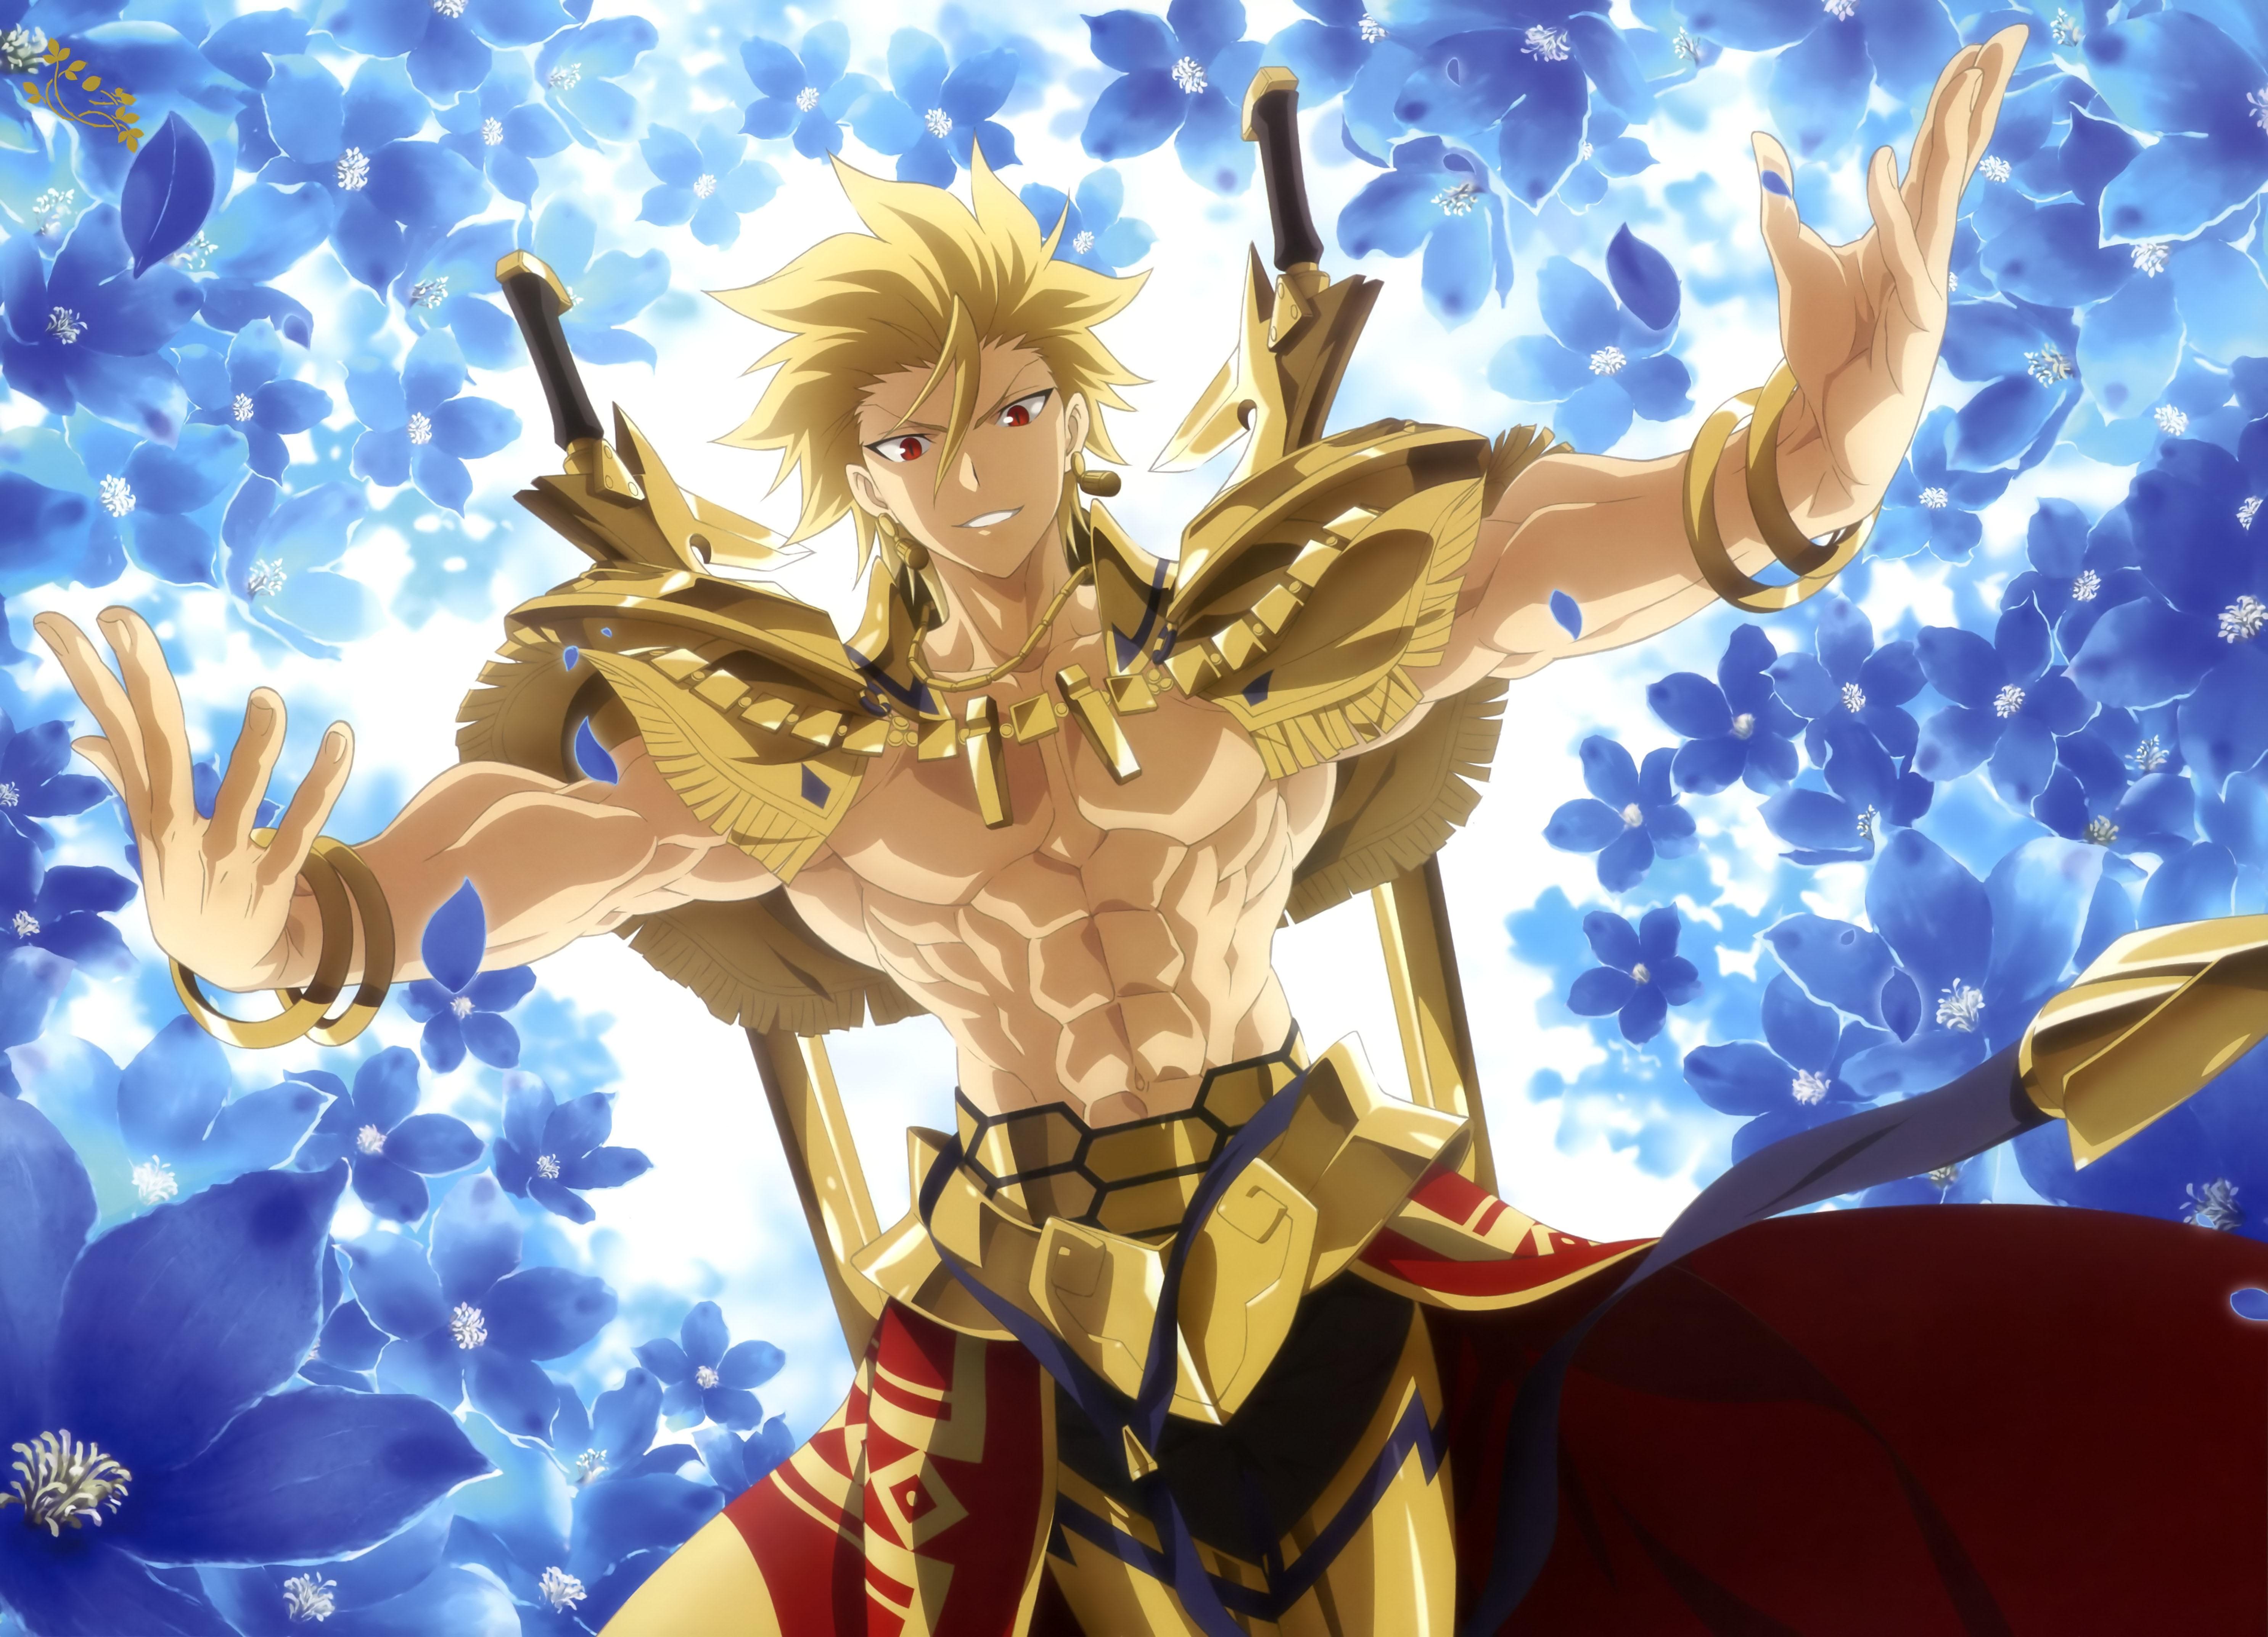 Anime 5946x4291 Fate/Prototype Gilgamesh red eyes anime short hair blonde anime boys